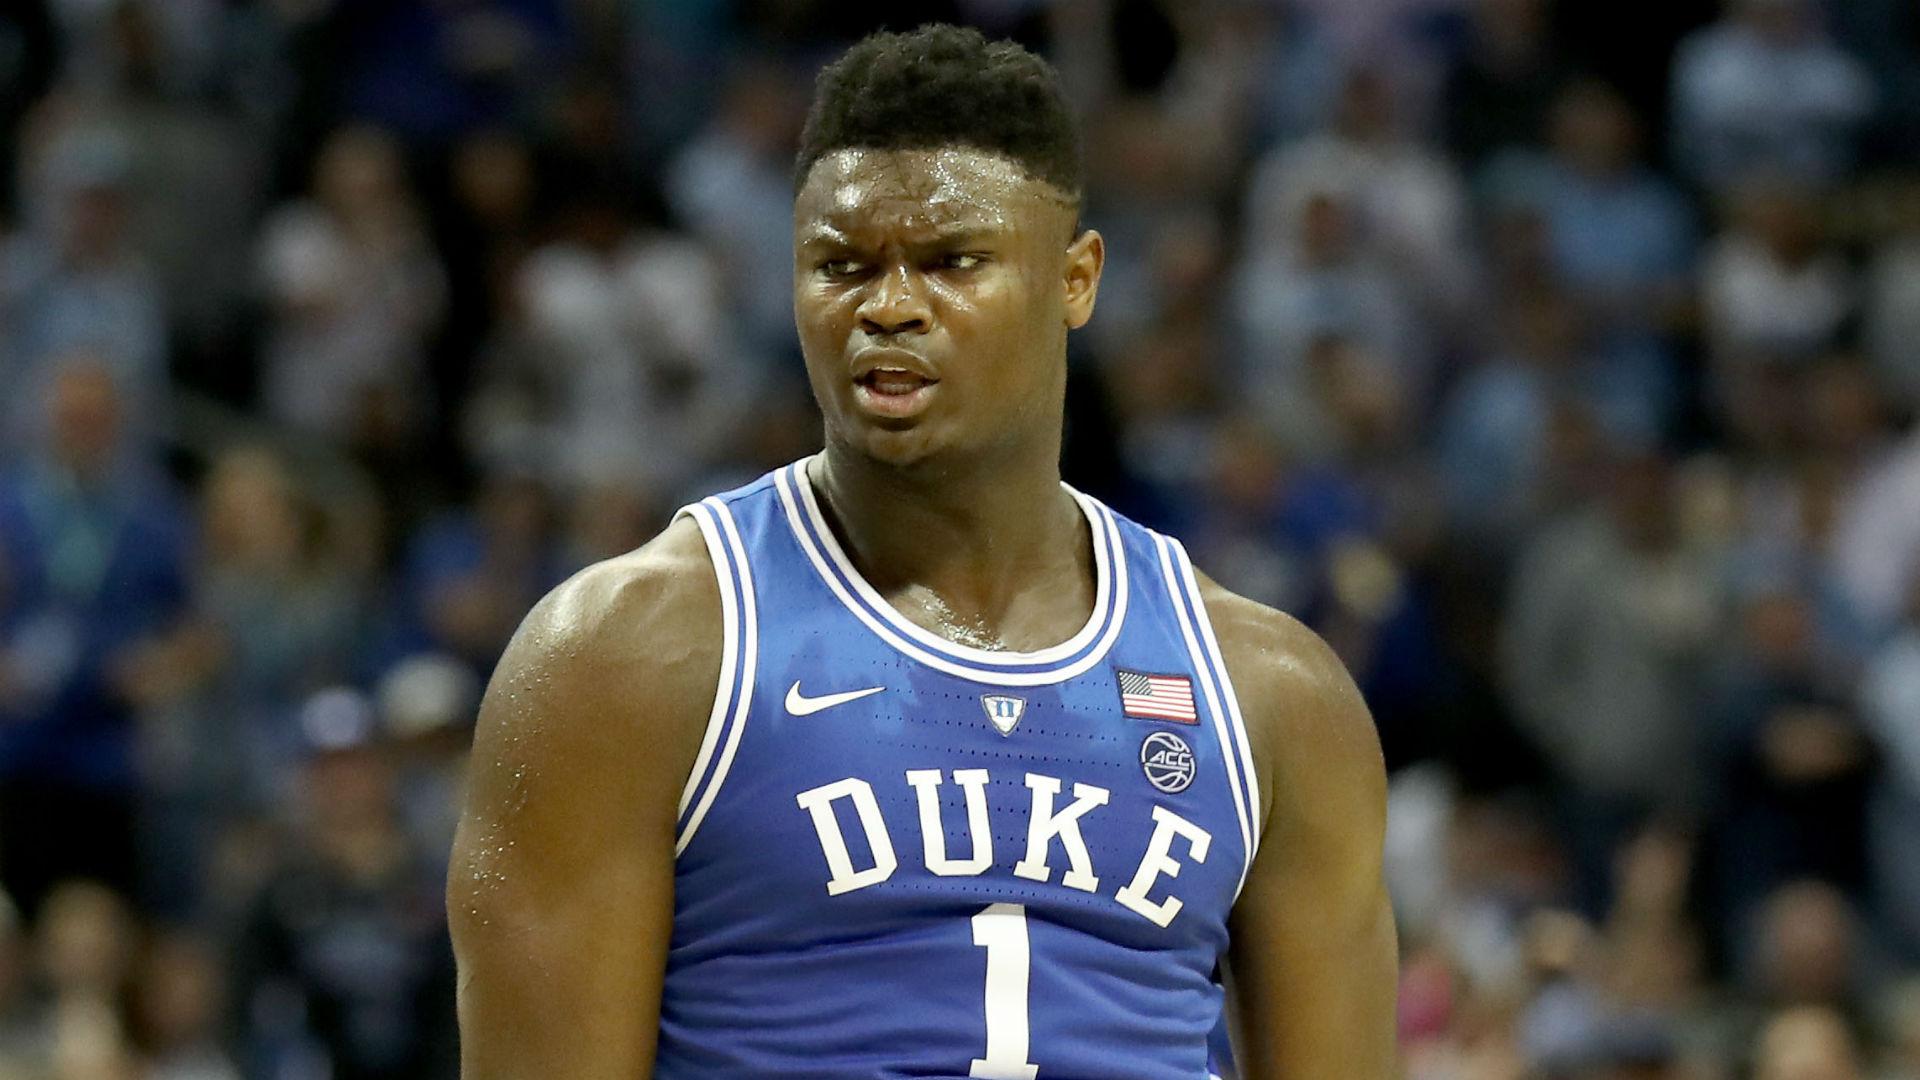 Flipboard: Zion Leads Duke To Close Win Over North